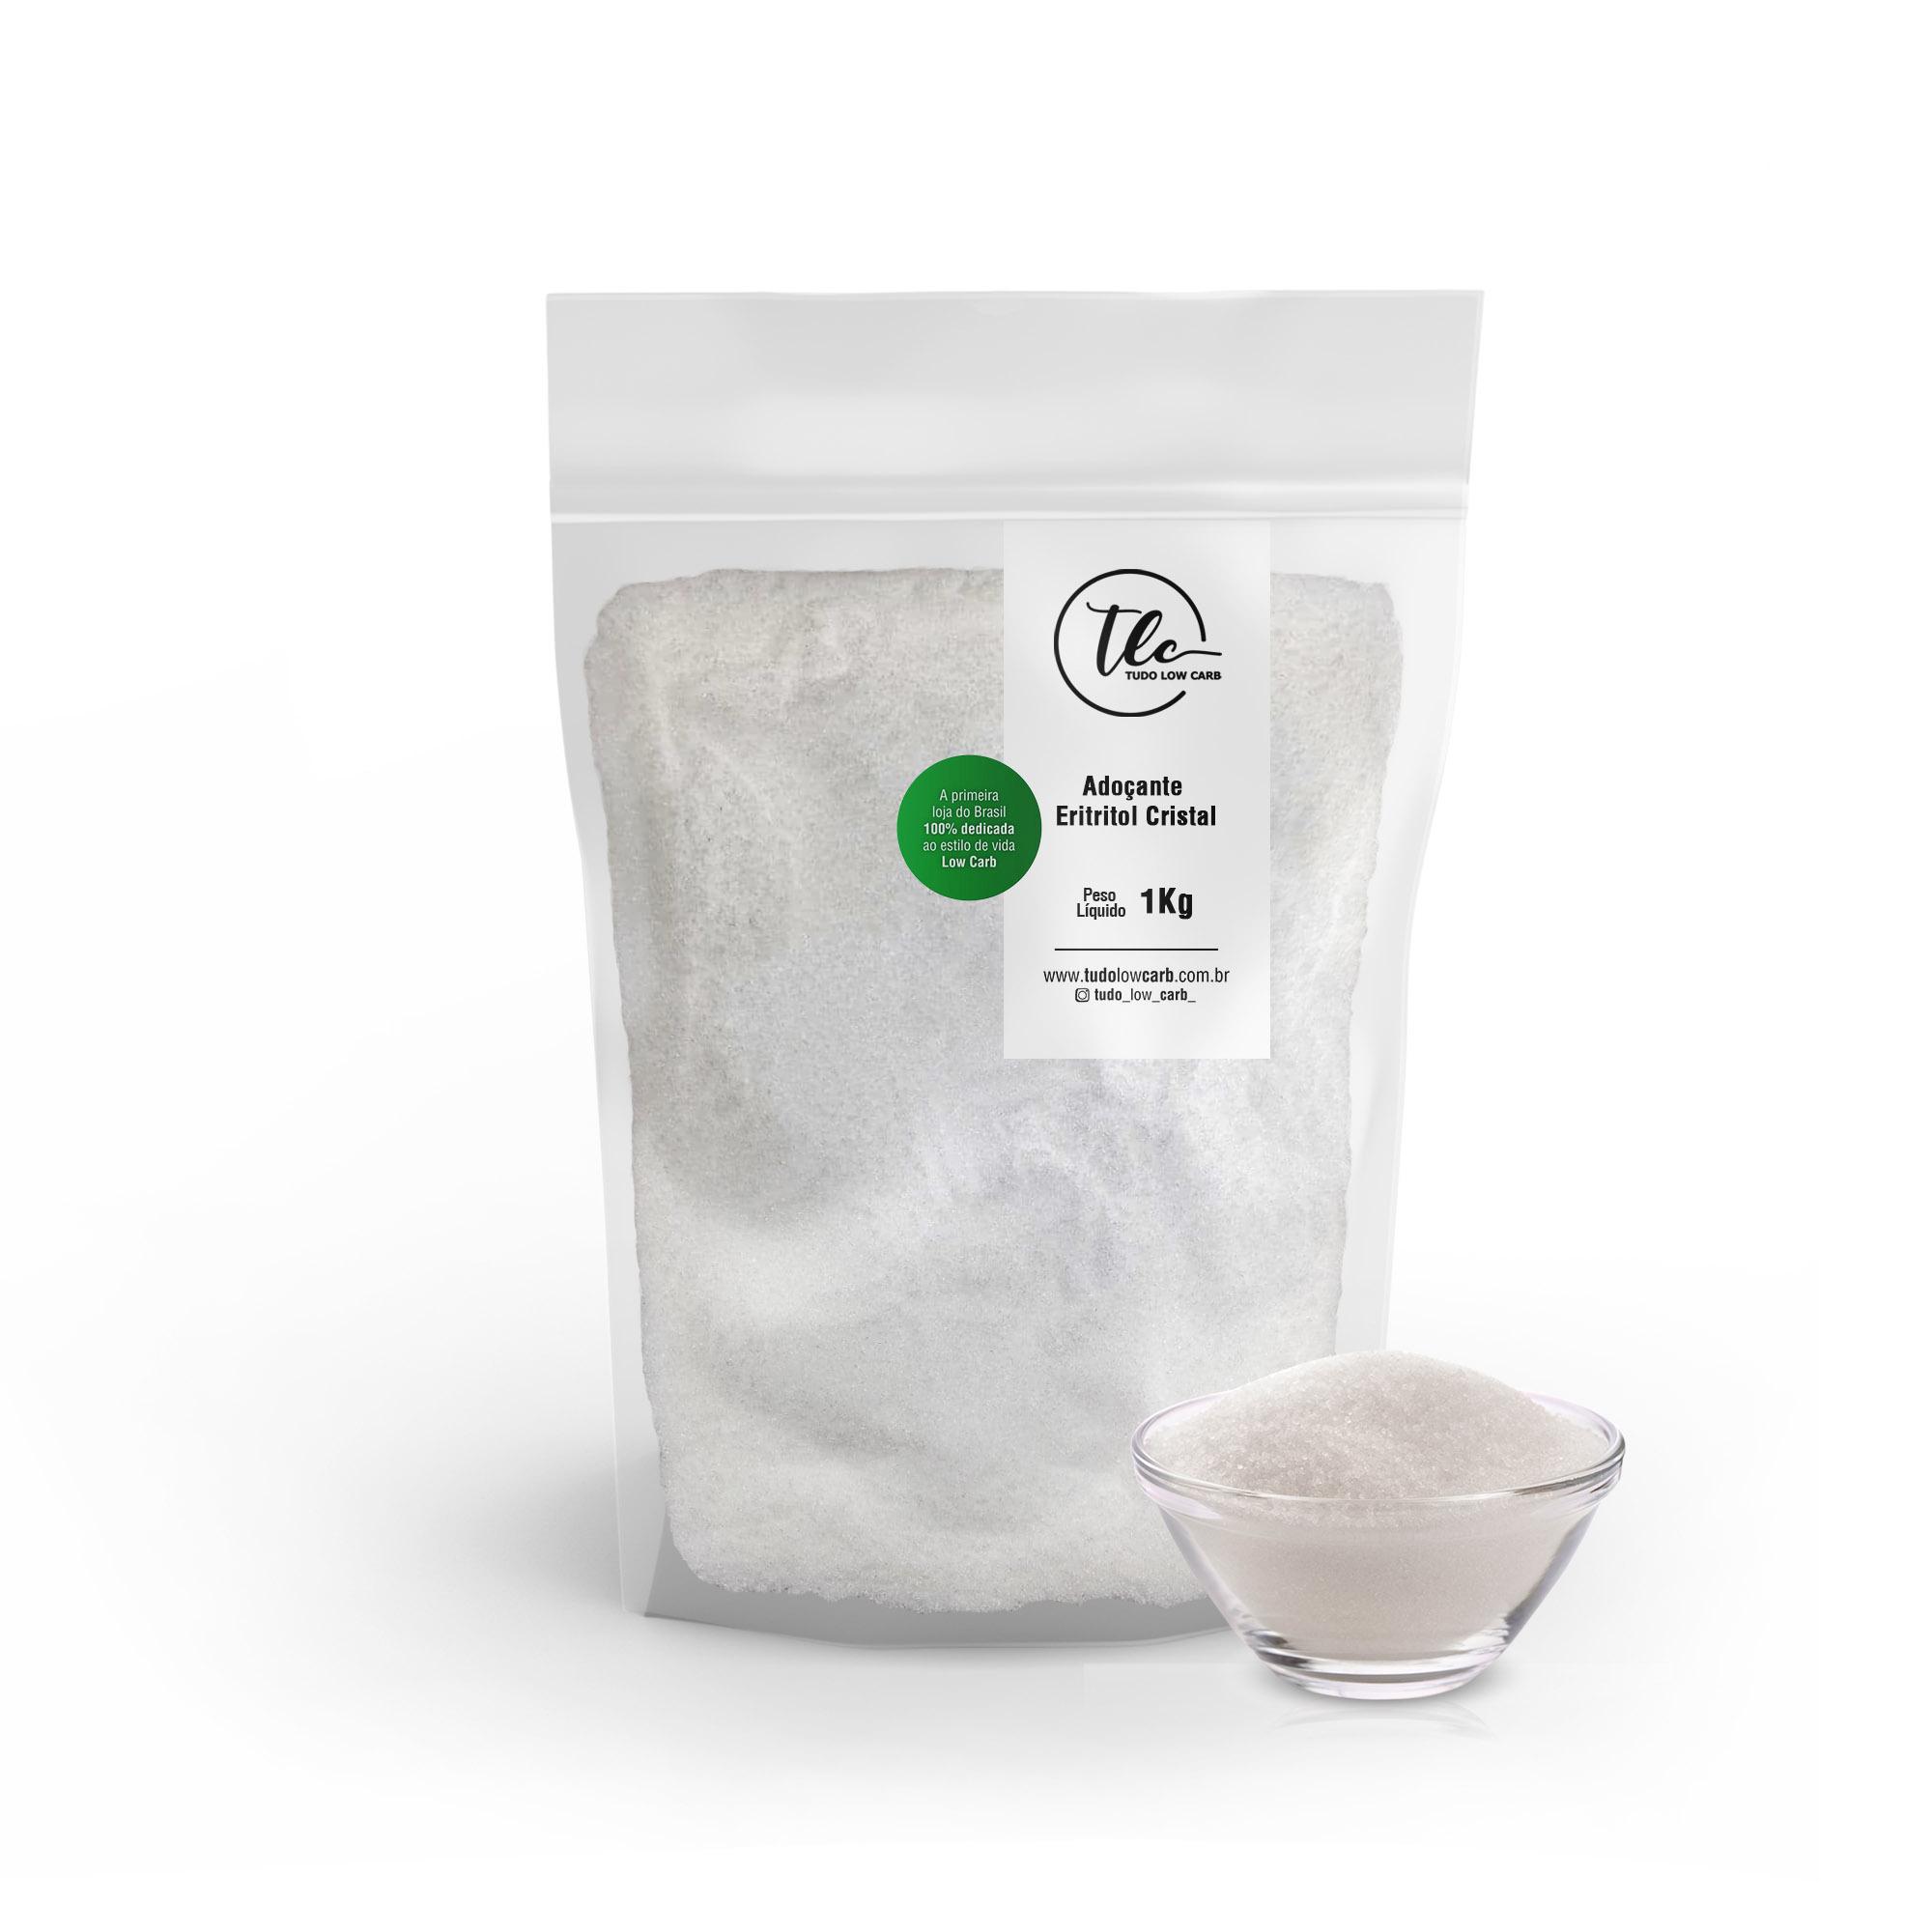 Combo Adoçante Eritritol Cristal 3 Kg  - TLC Tudo Low Carb